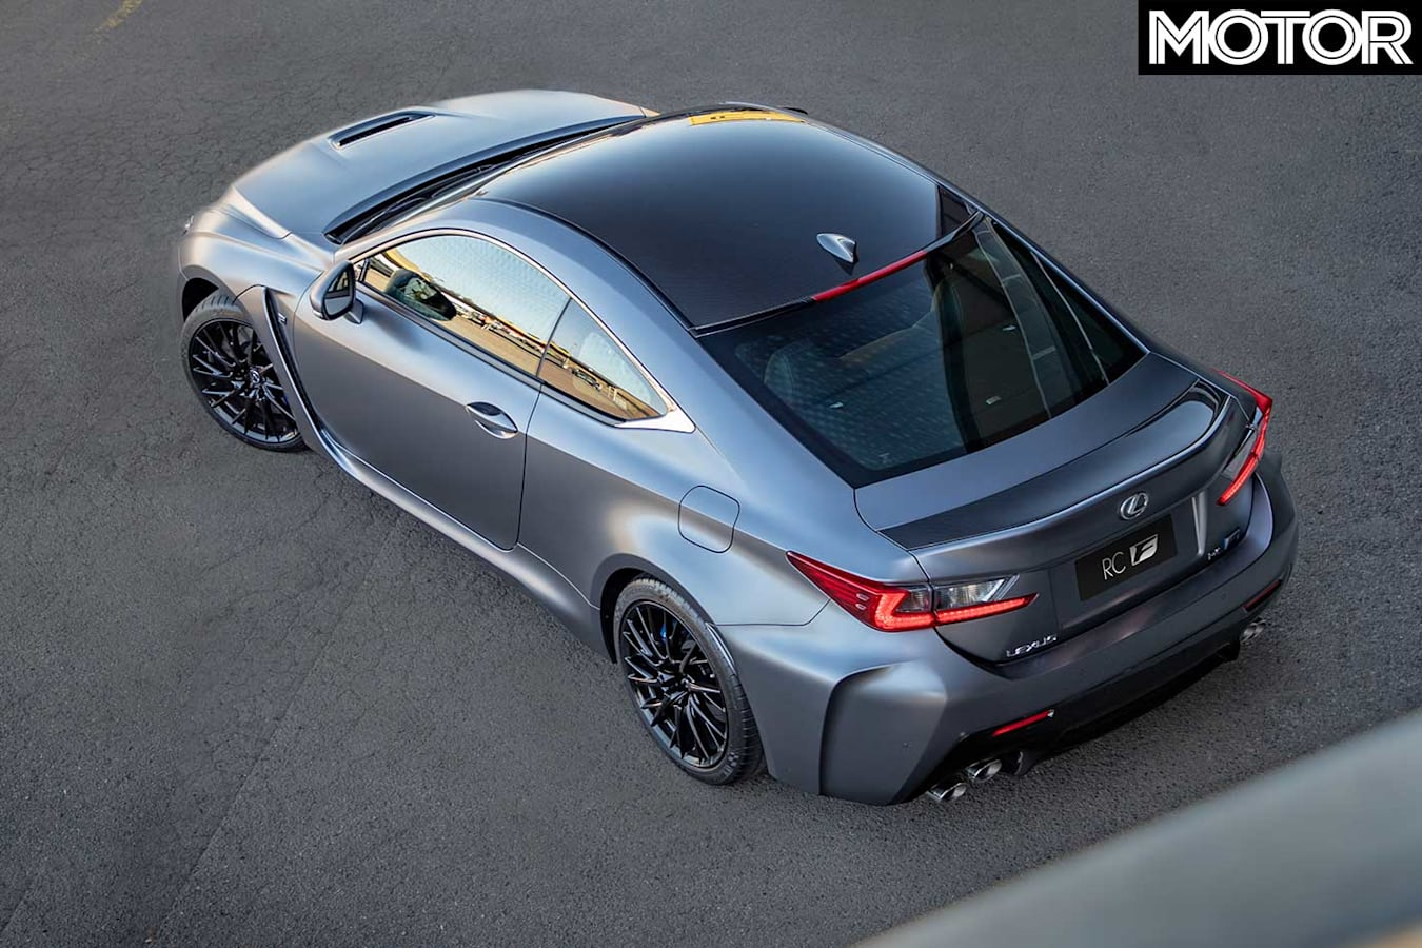 Lexus RC F 10th Anniversary Top Jpg